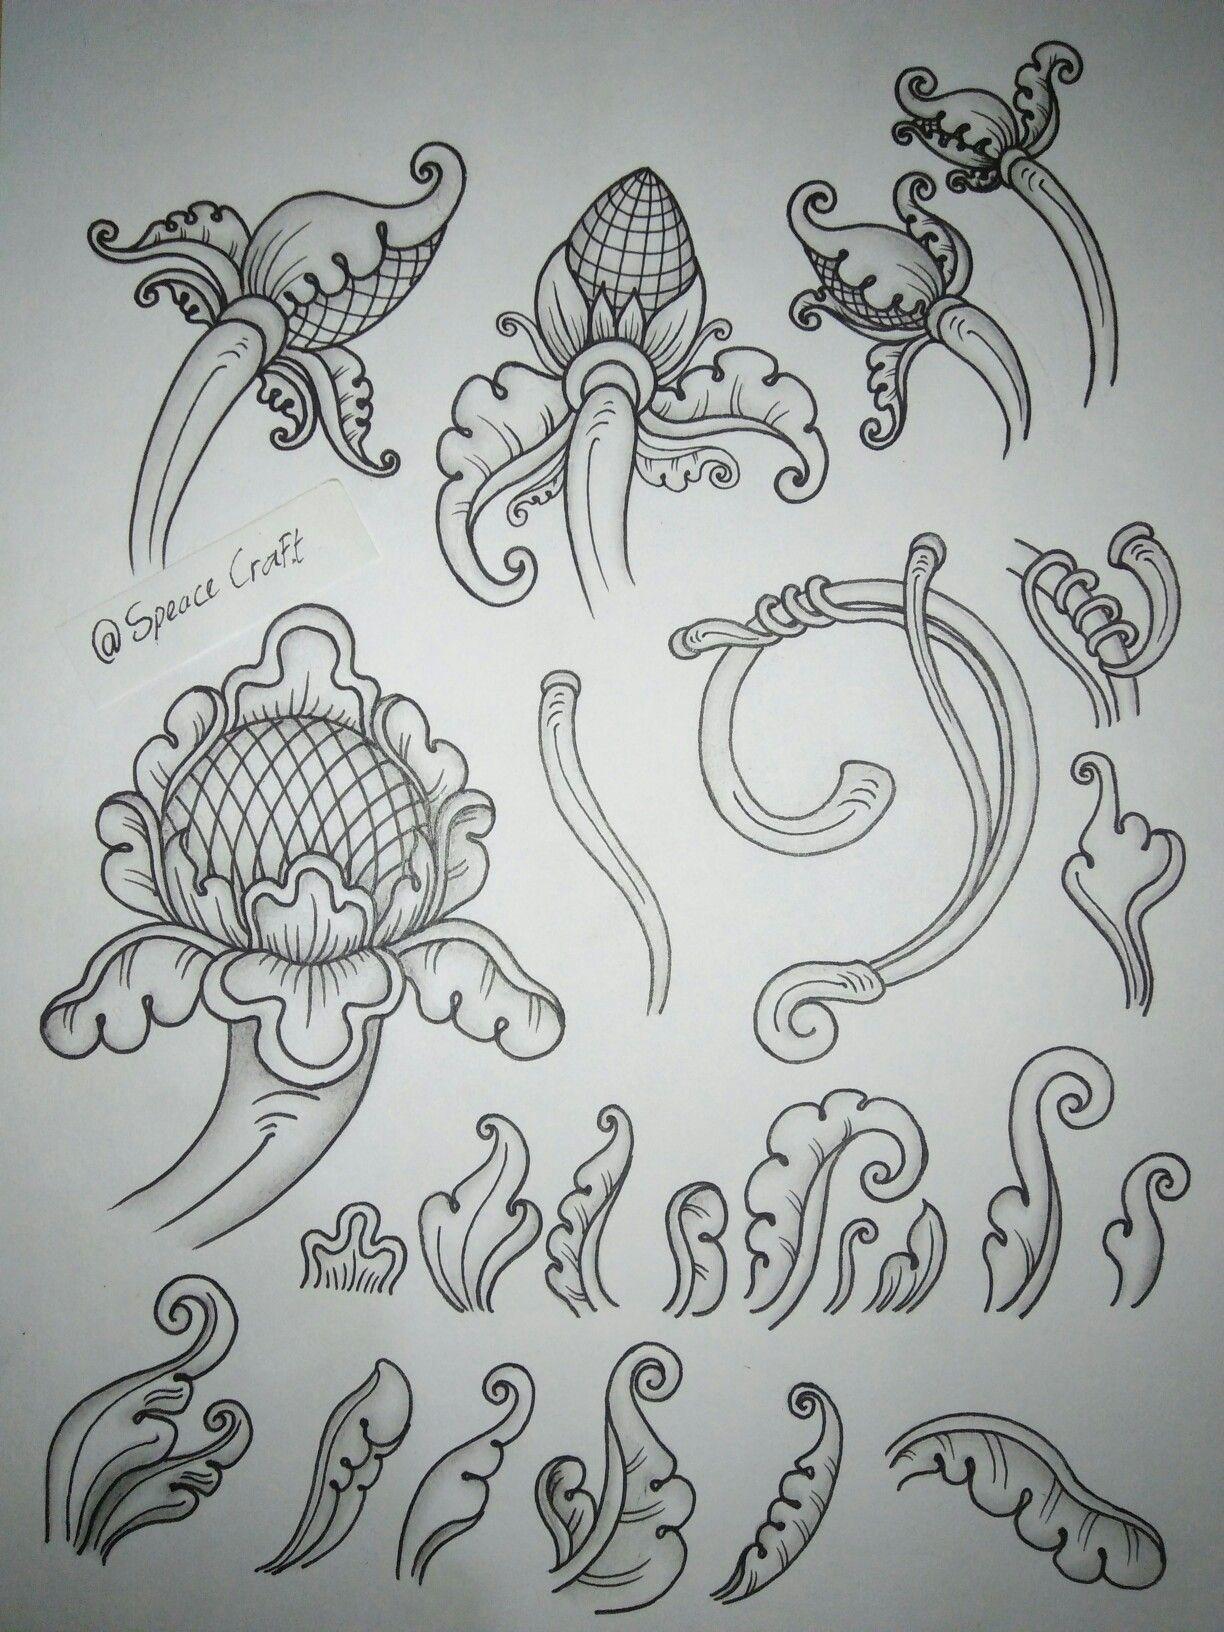 Contoh Gambar Ornamen : contoh, gambar, ornamen, Ornamen, Yogyakarta, Hiasan, Ornamen,